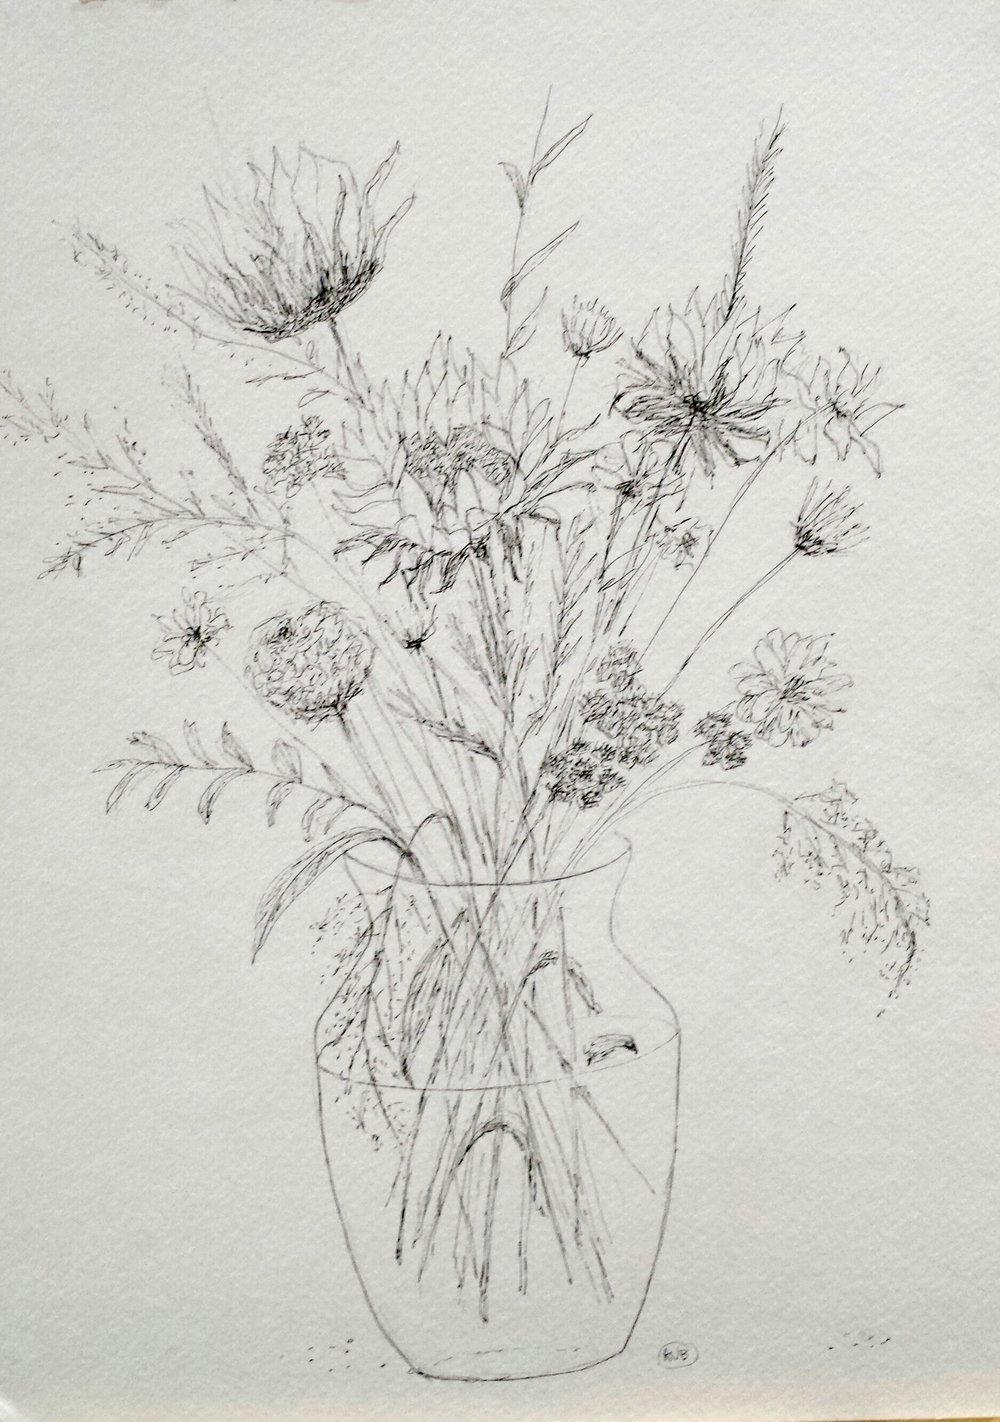 Sunflowers, graphite, 2016